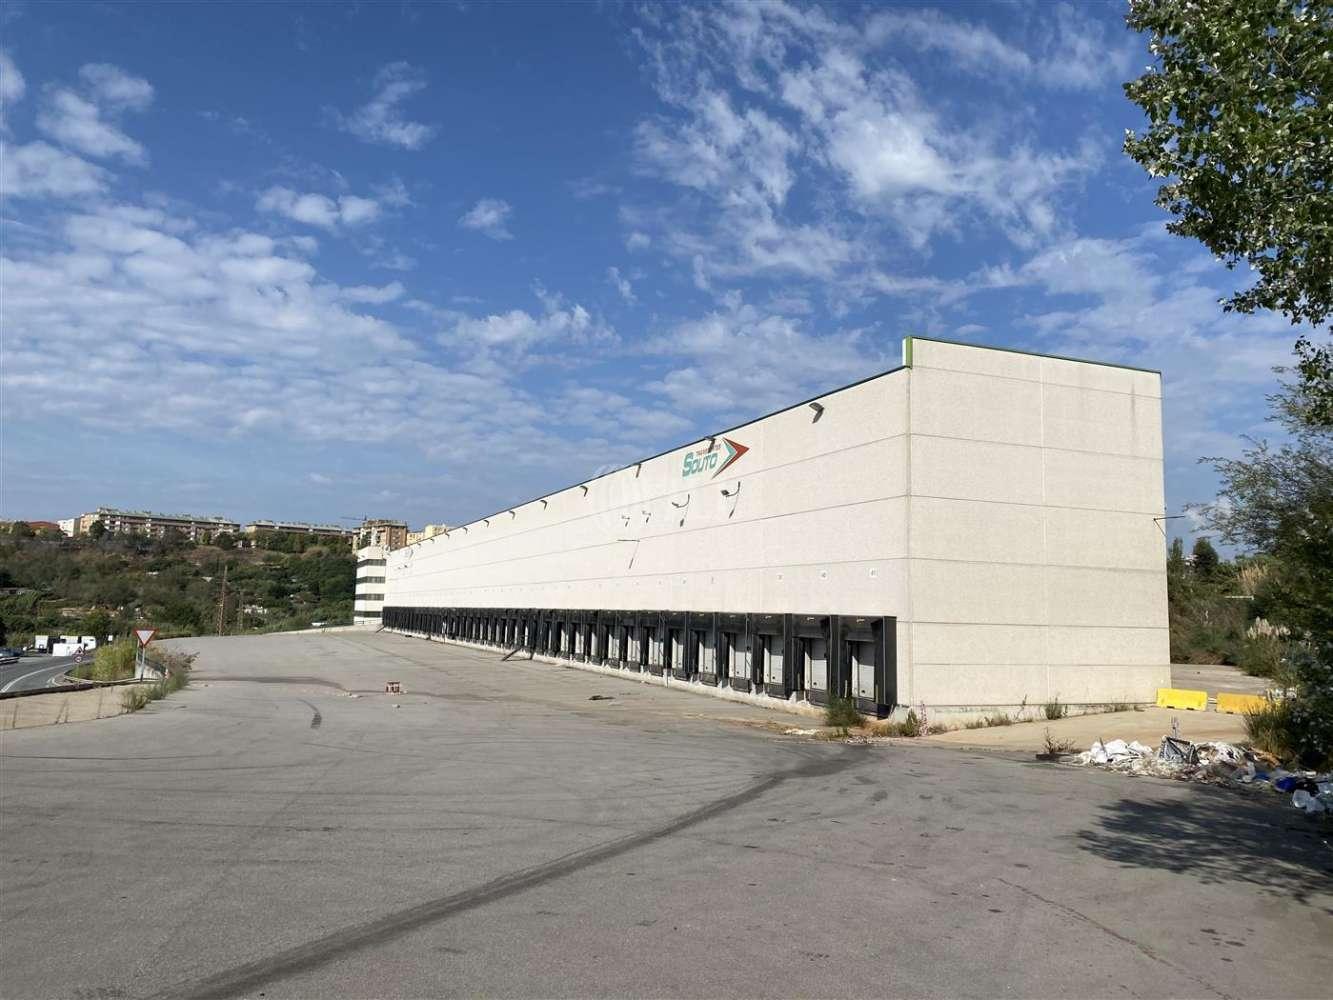 Naves industriales y logísticas Barberà del vallès, 08210 - NAVE B0566 - PI CAN RABELLA